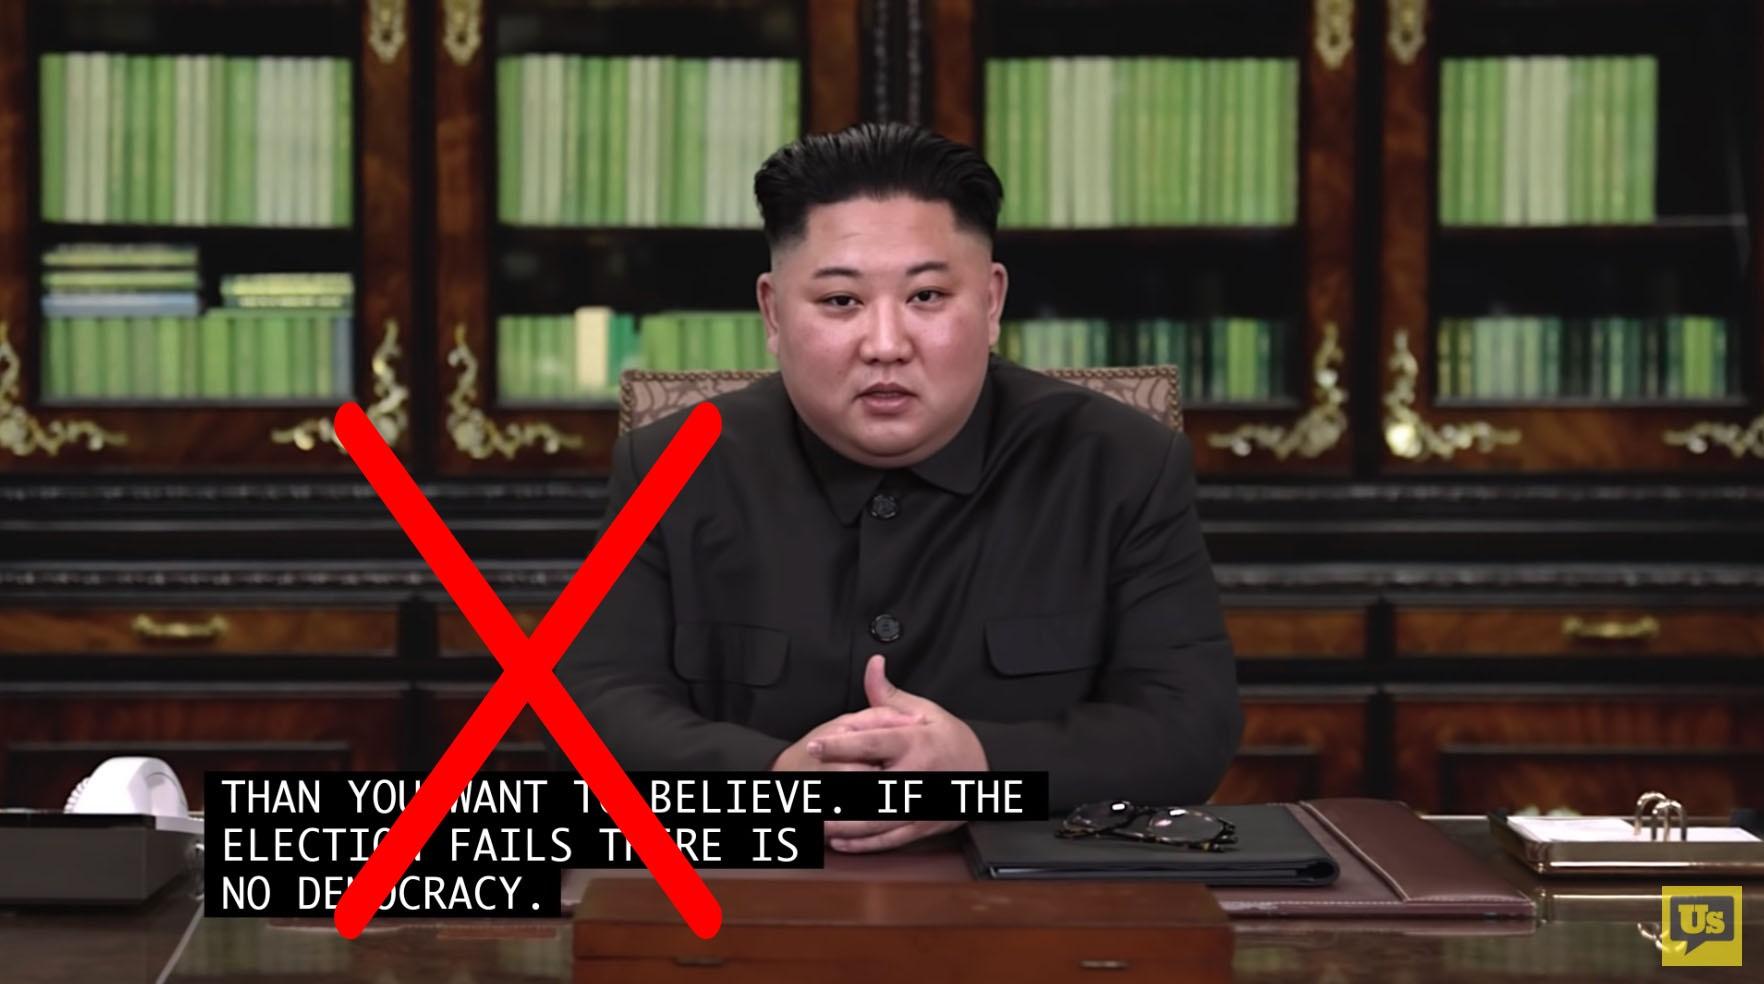 su nguy hiem cua cong nghe deepfake anh 4